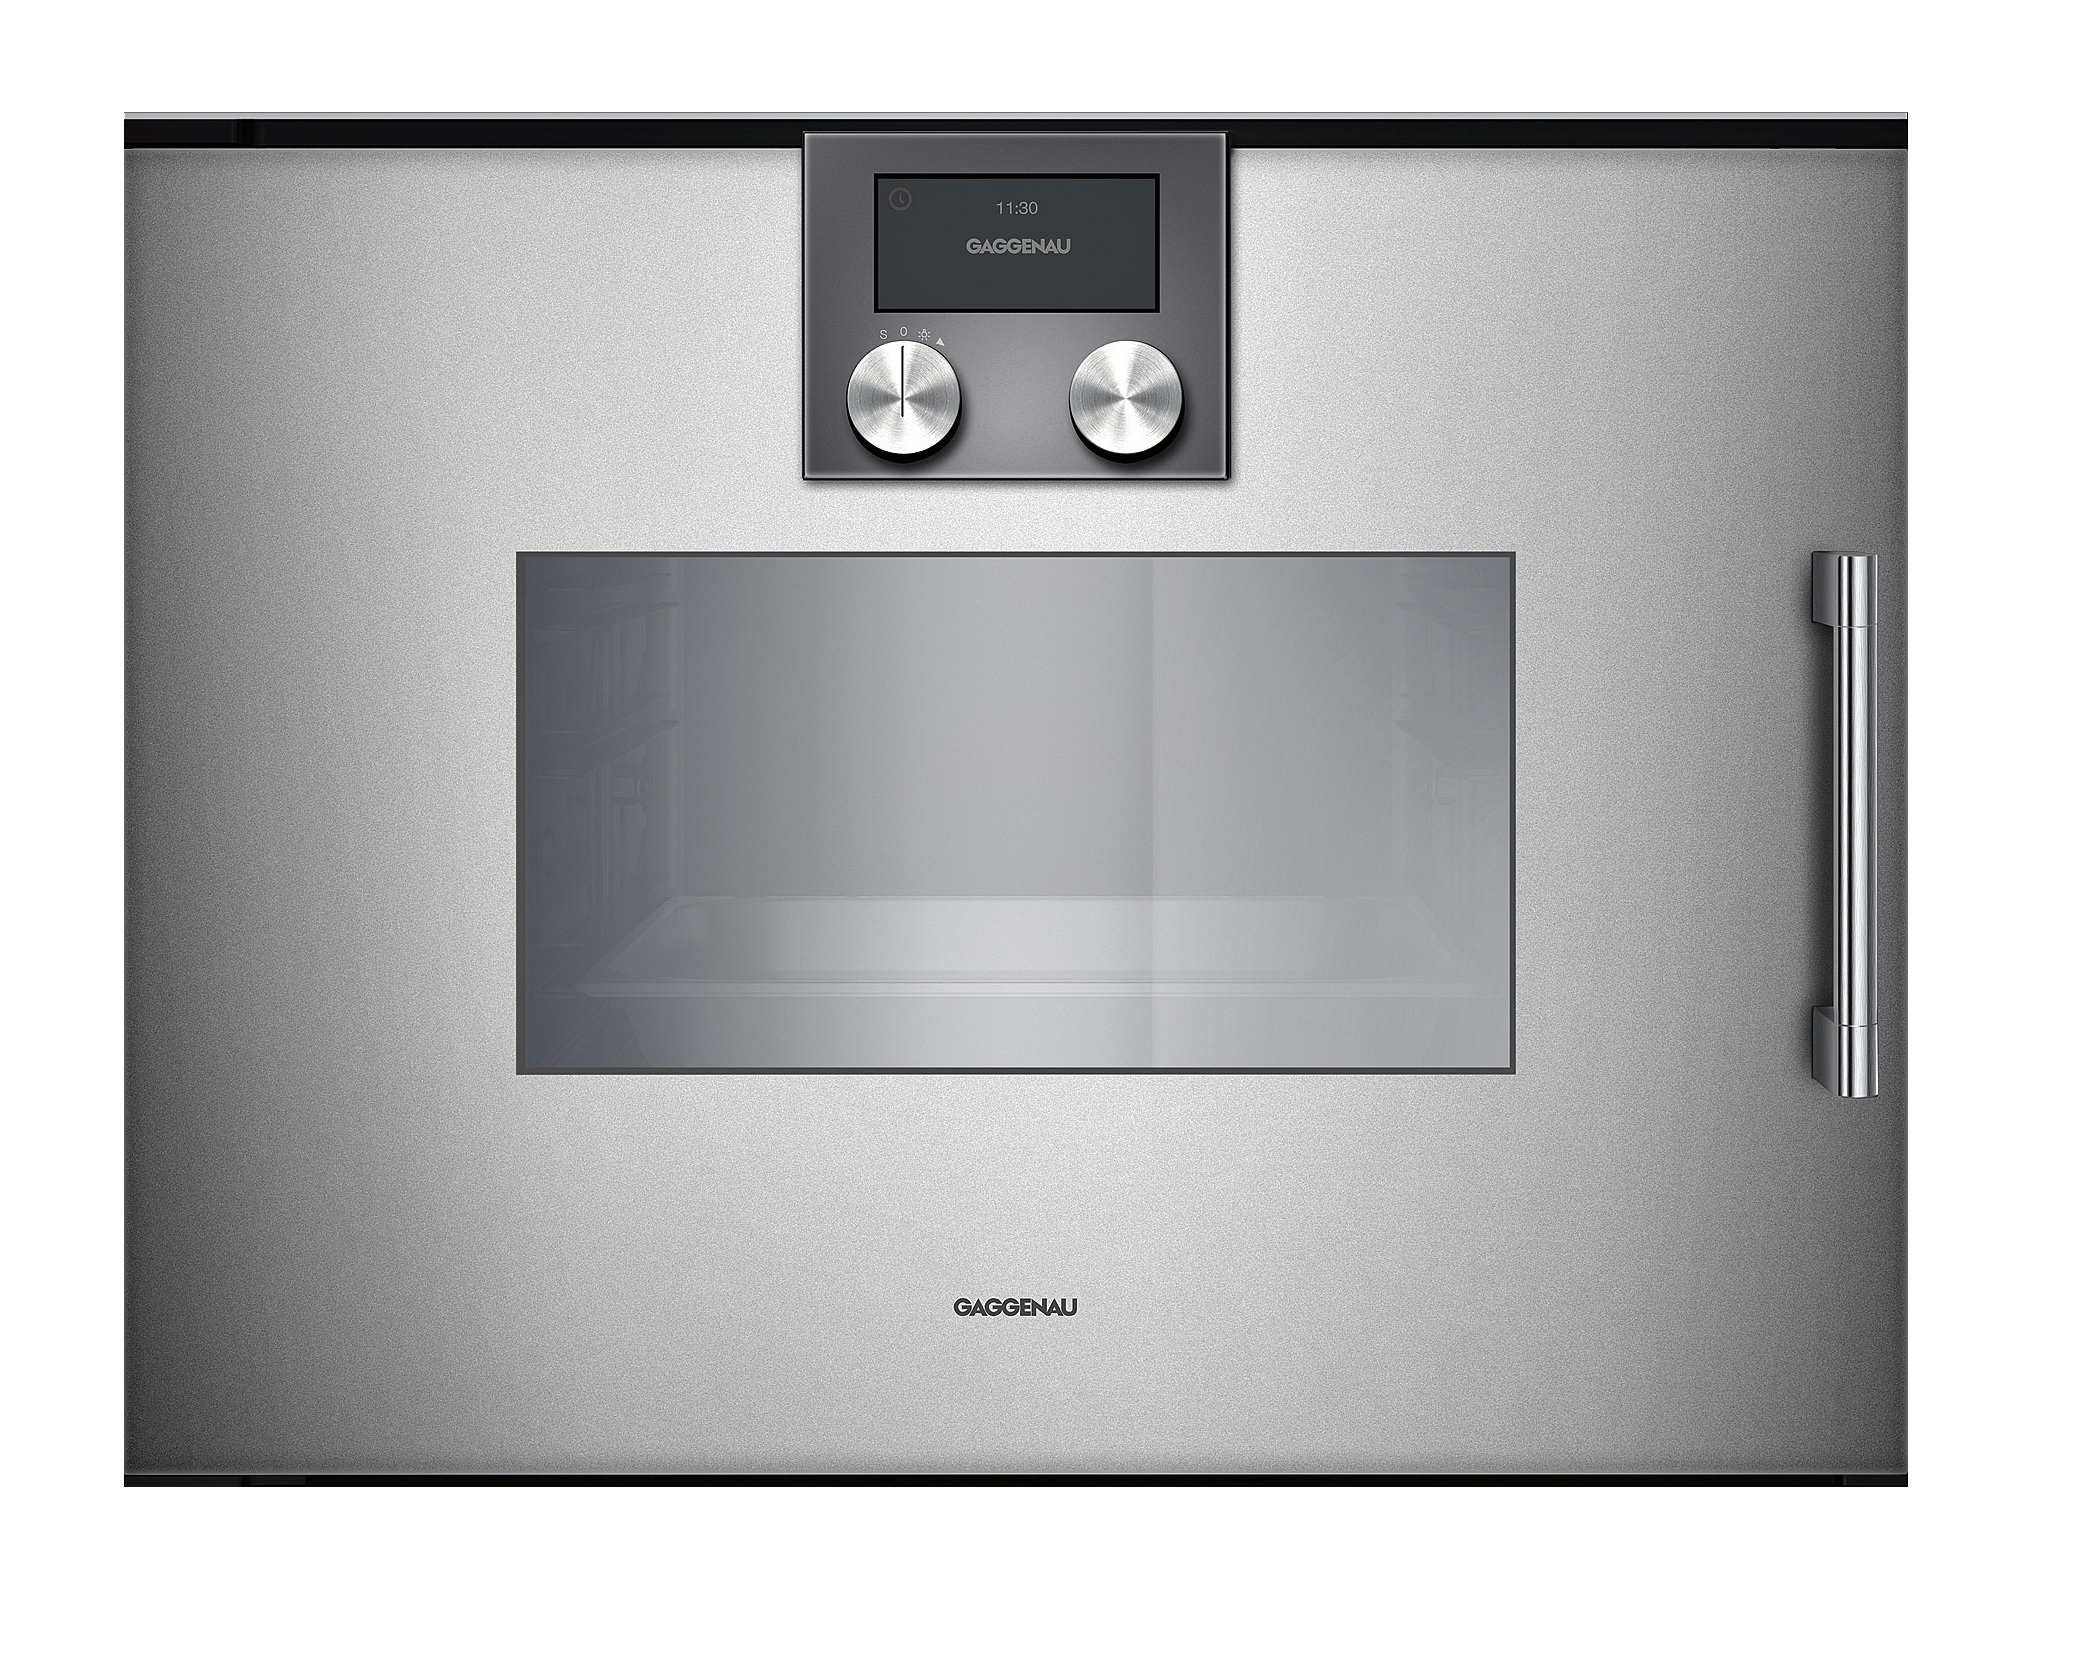 Gaggenau BSP221111 Oven